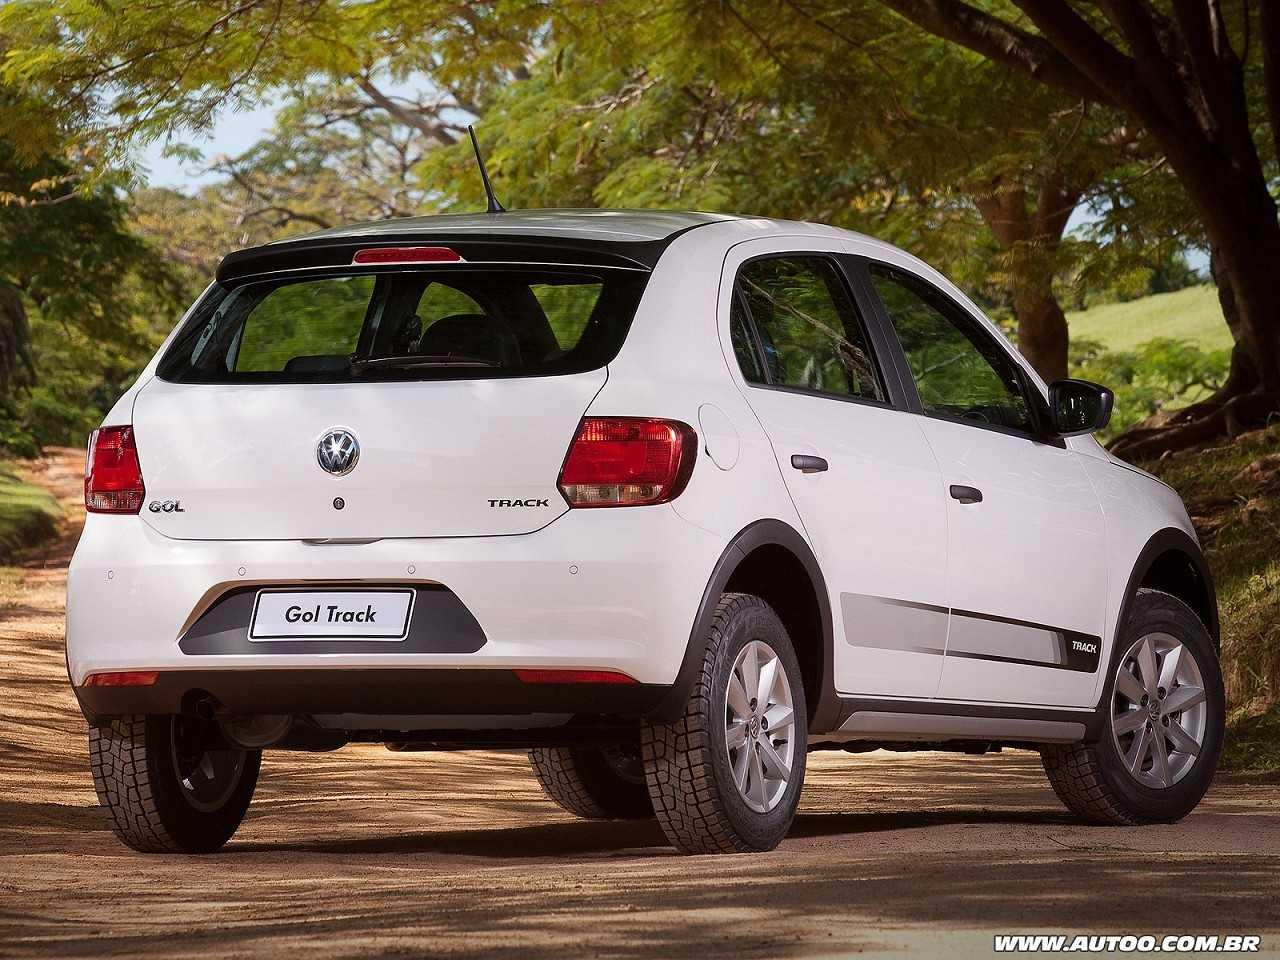 VolkswagenGol 2016 - ângulo traseiro